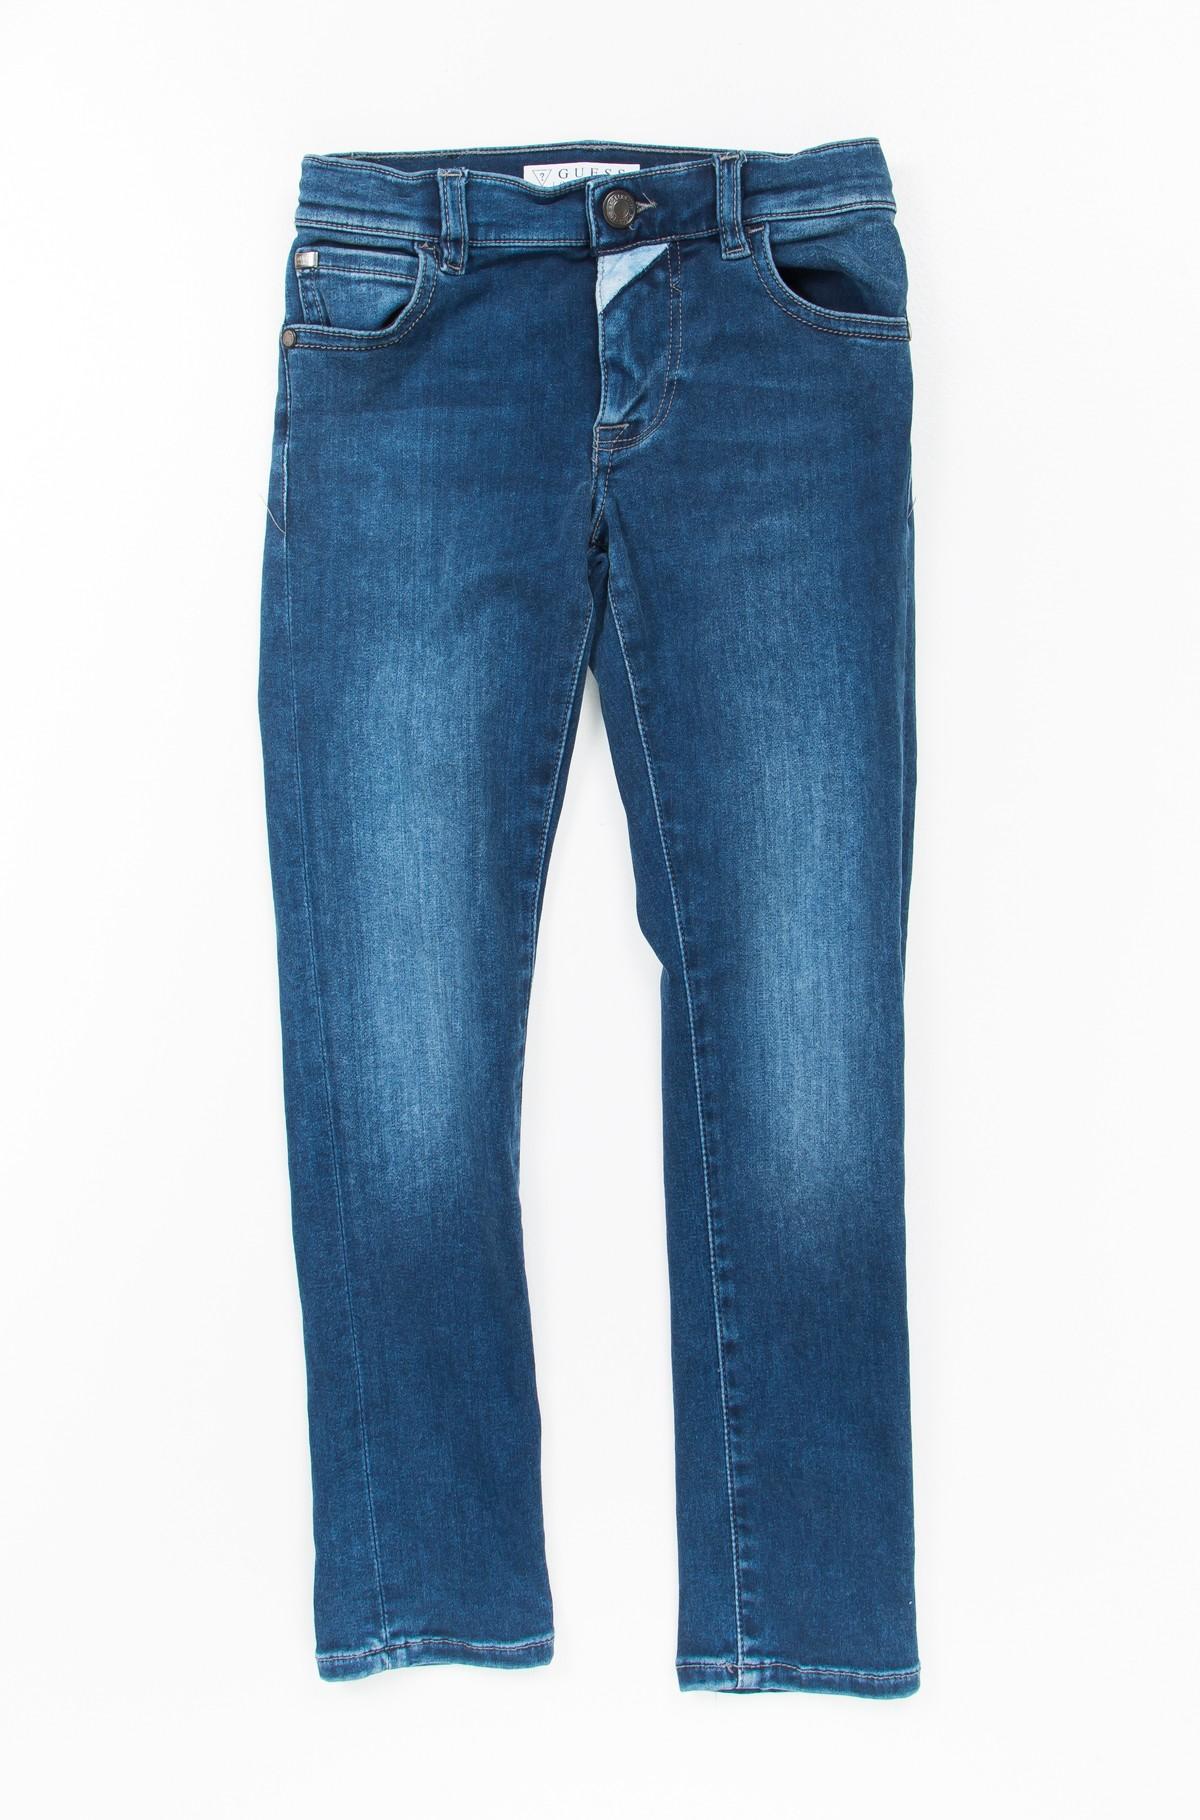 Kids jeans L74A13 D2R70-full-1